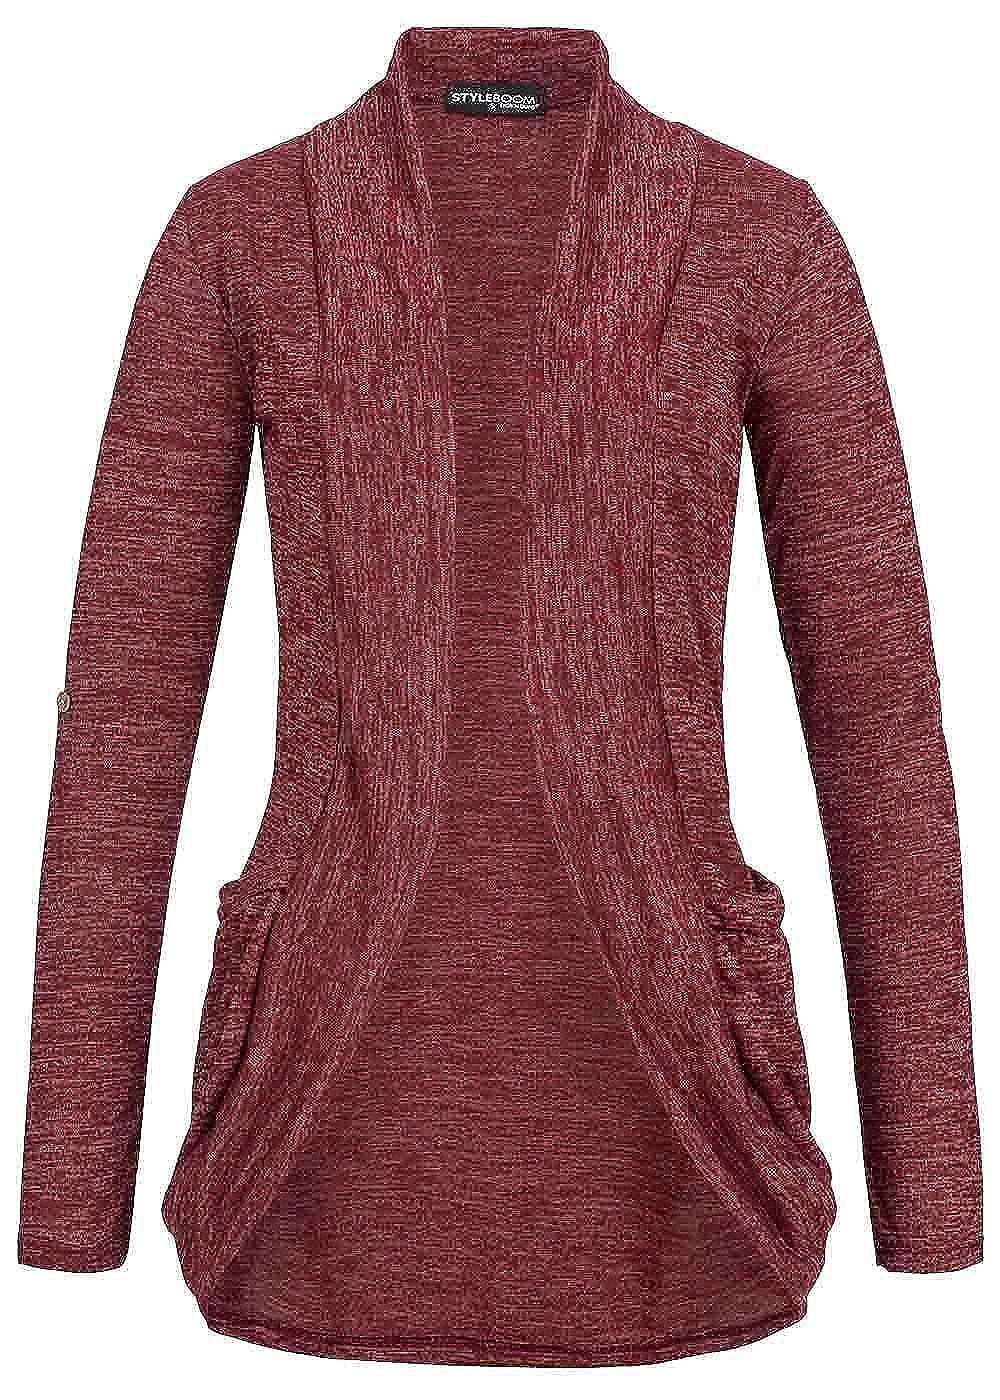 b8da91190947f8 Styleboom Fashion Damen Turn-Up Cardigan 2 Taschen bordeaux rot: Amazon.de:  Bekleidung